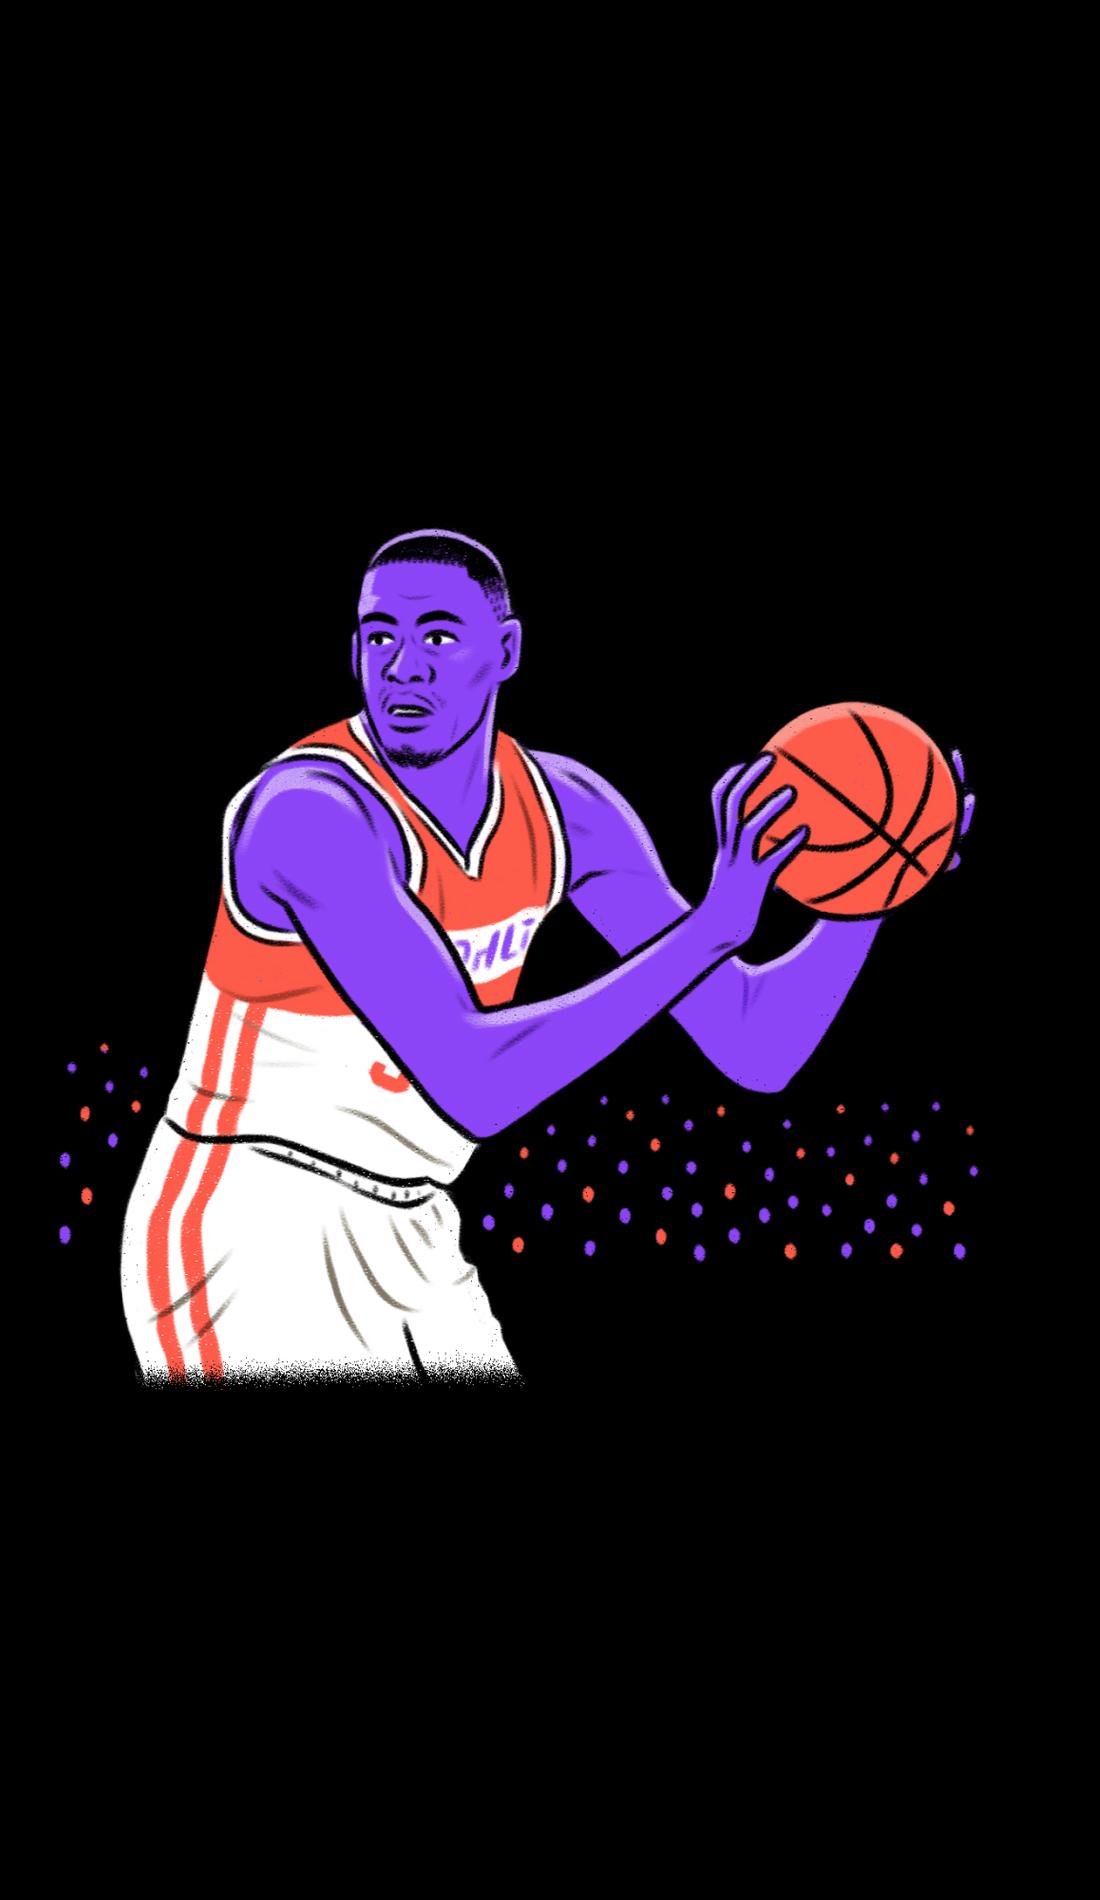 A Loyola Maryland Greyhounds Basketball live event